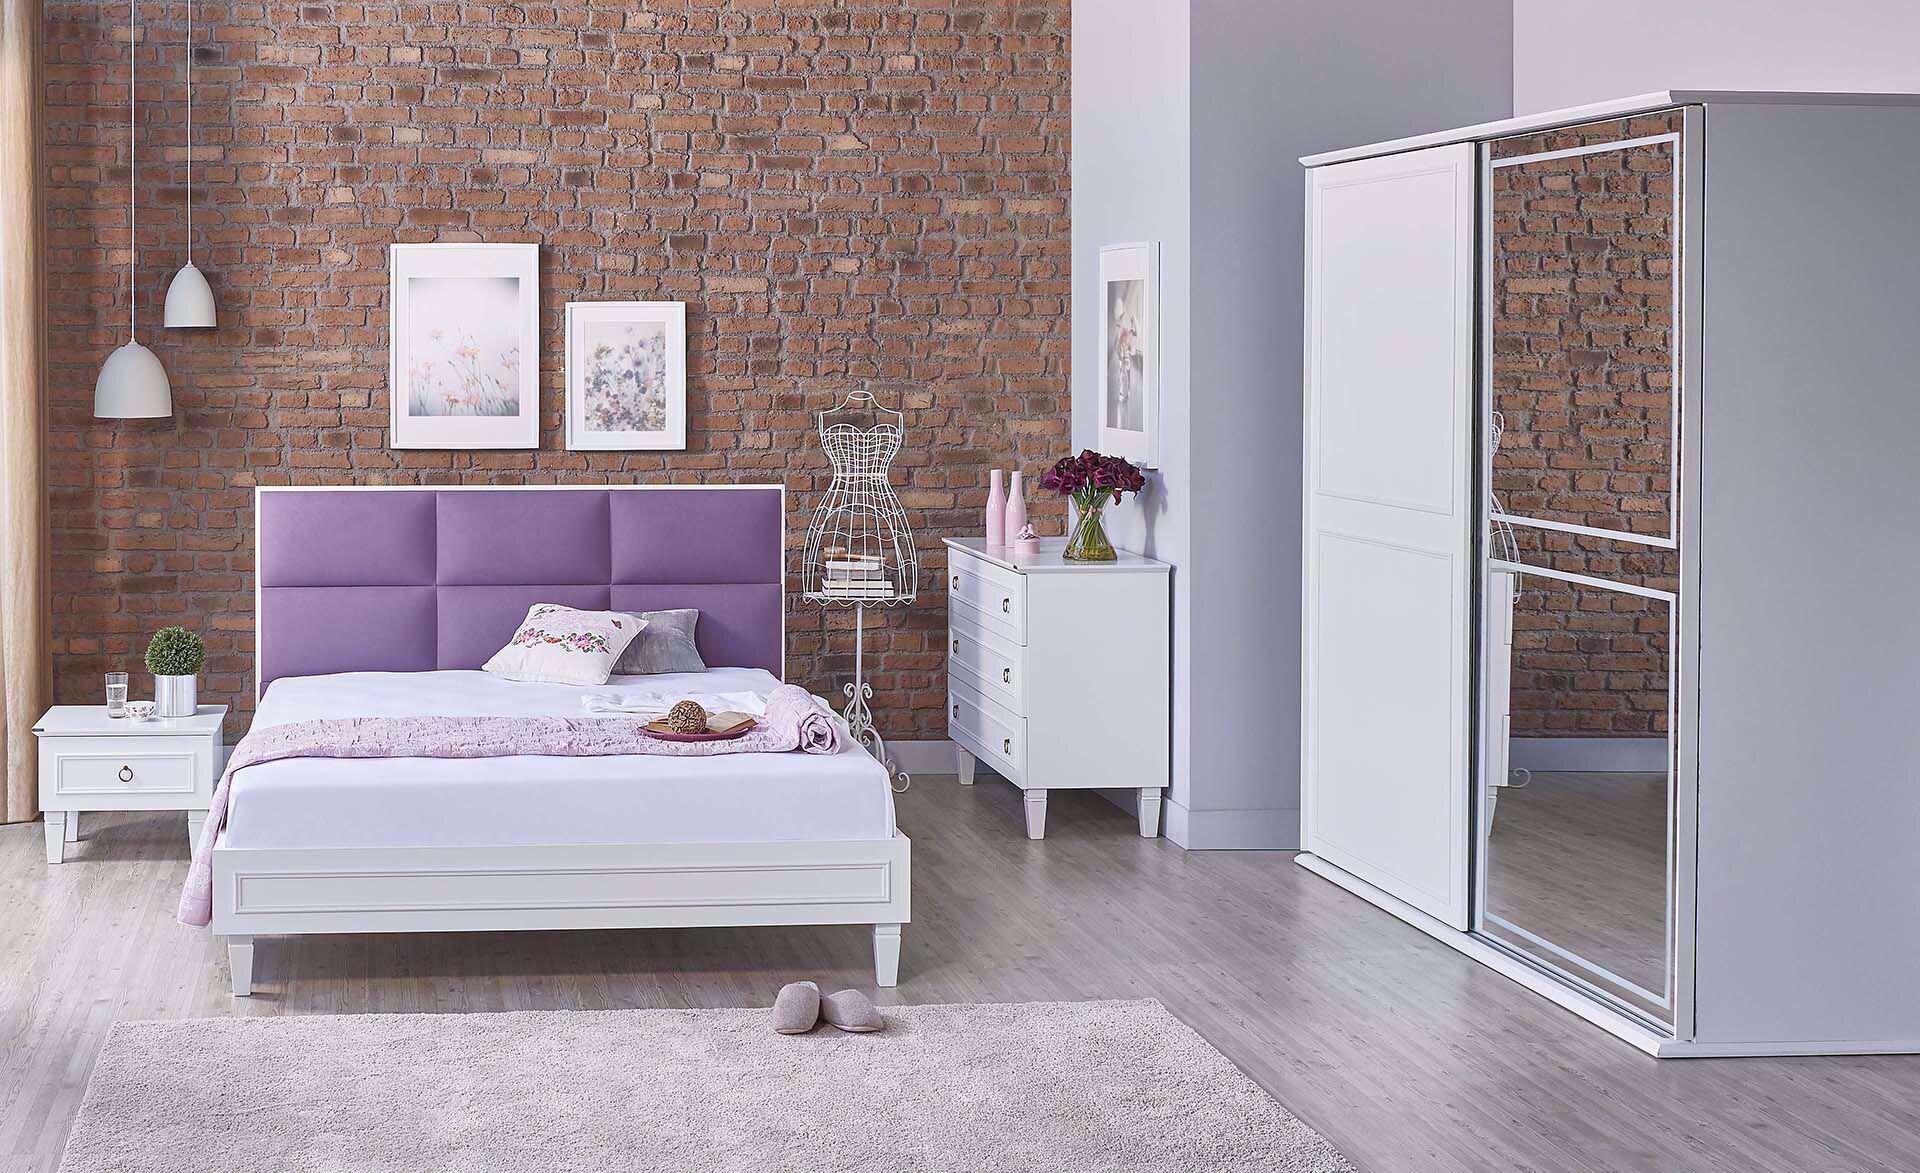 Cara Bedstead (with Base) 160*200cm (Incl. Headboard) (Purple)